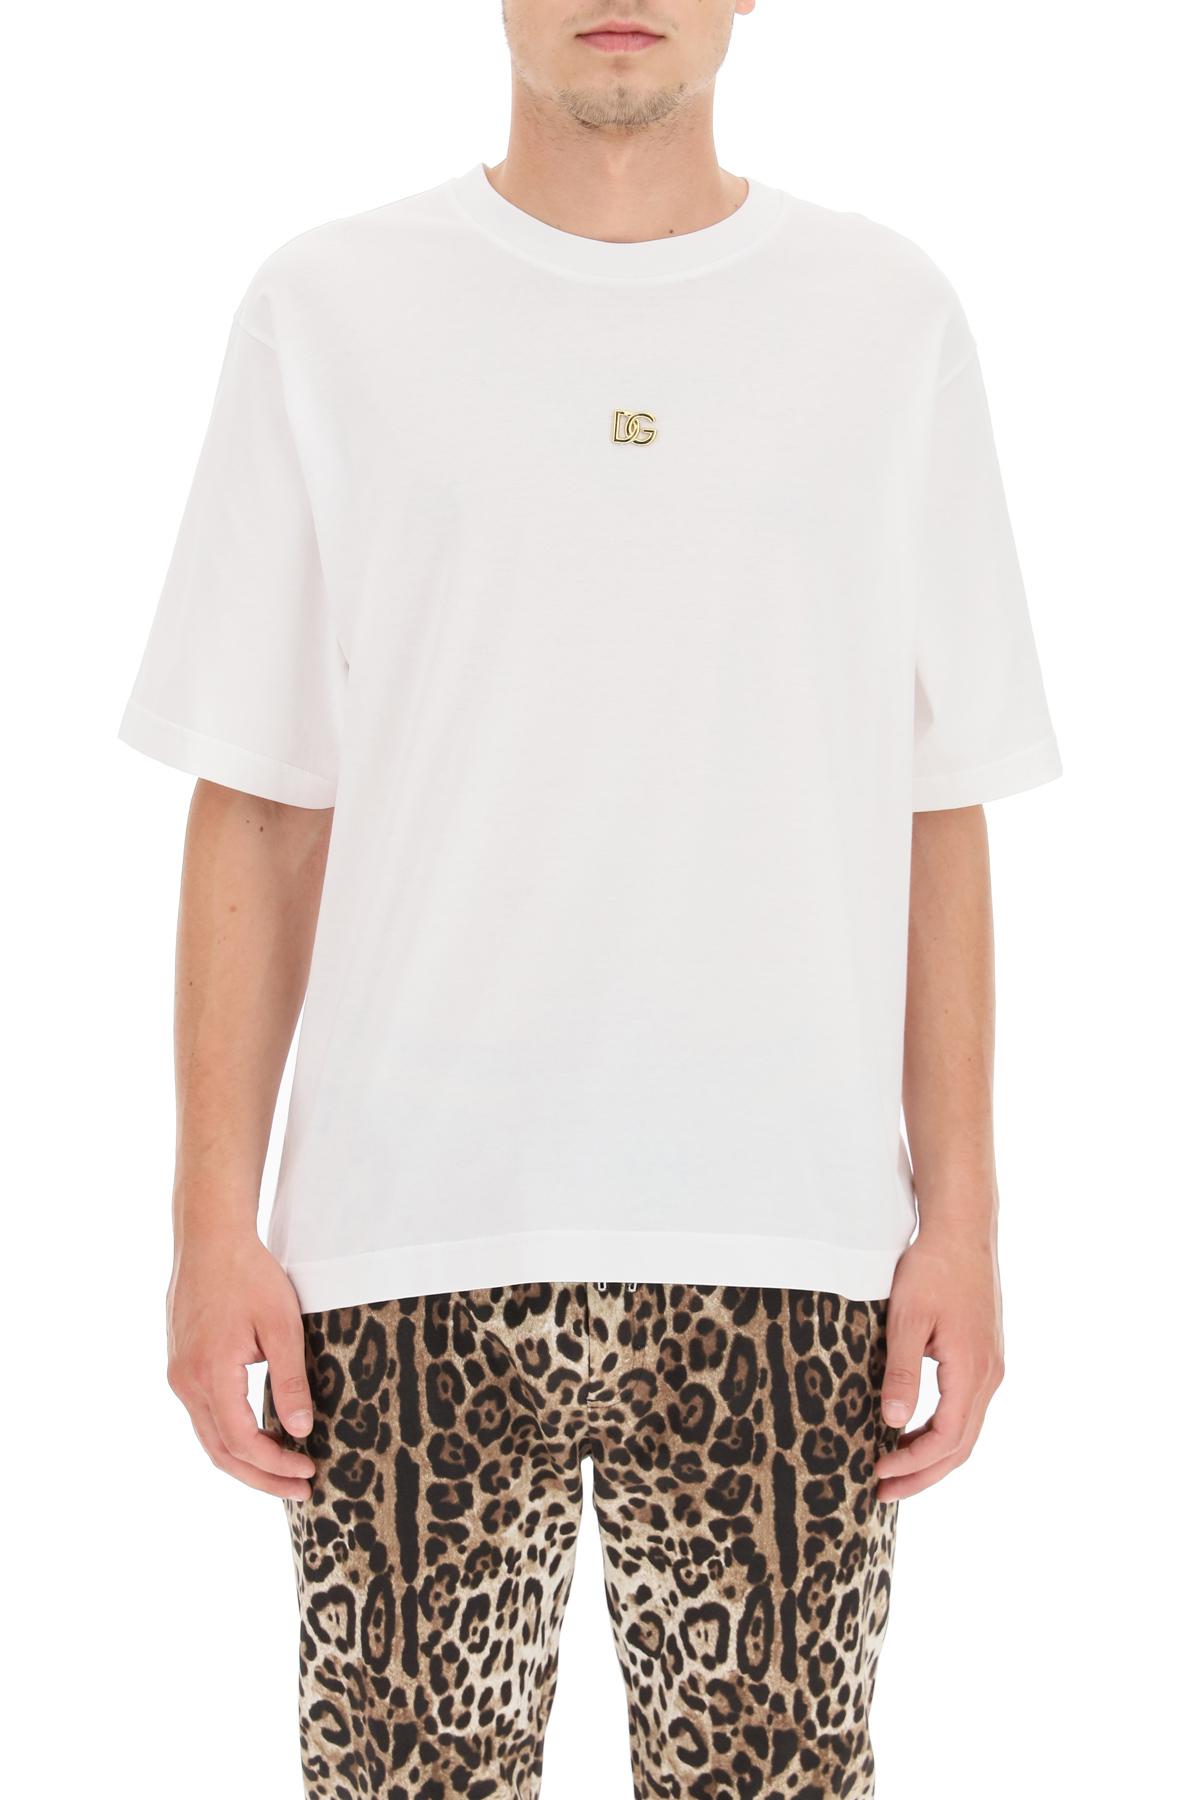 Dolce & gabbana t-shirt con logo dg metallico